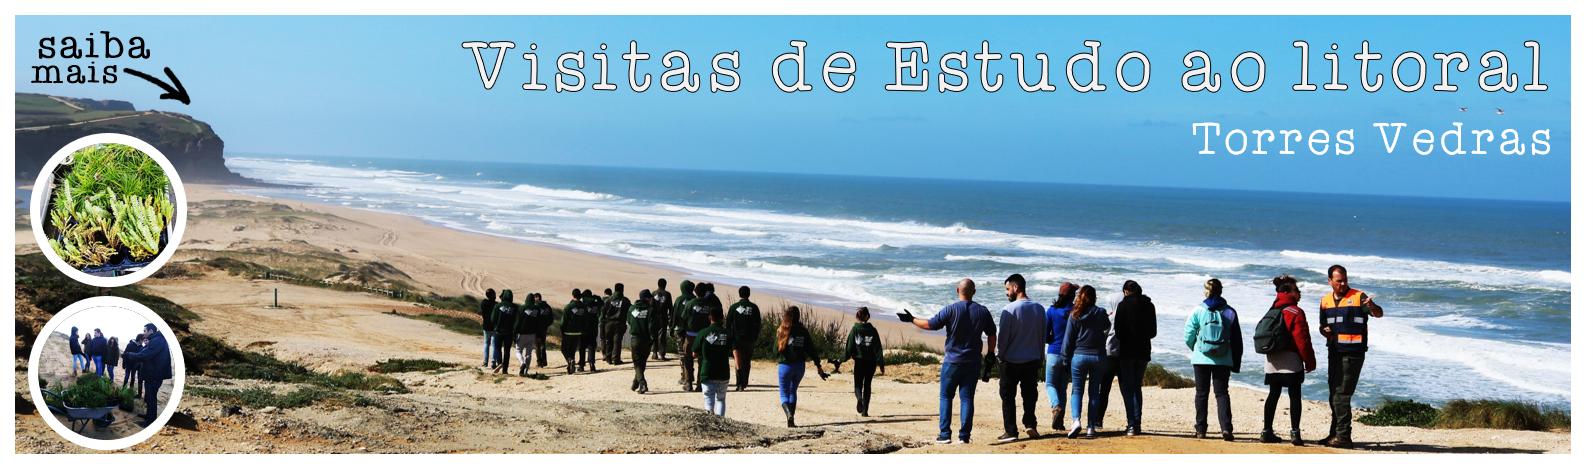 Visitas ao litoral Torres Vedras